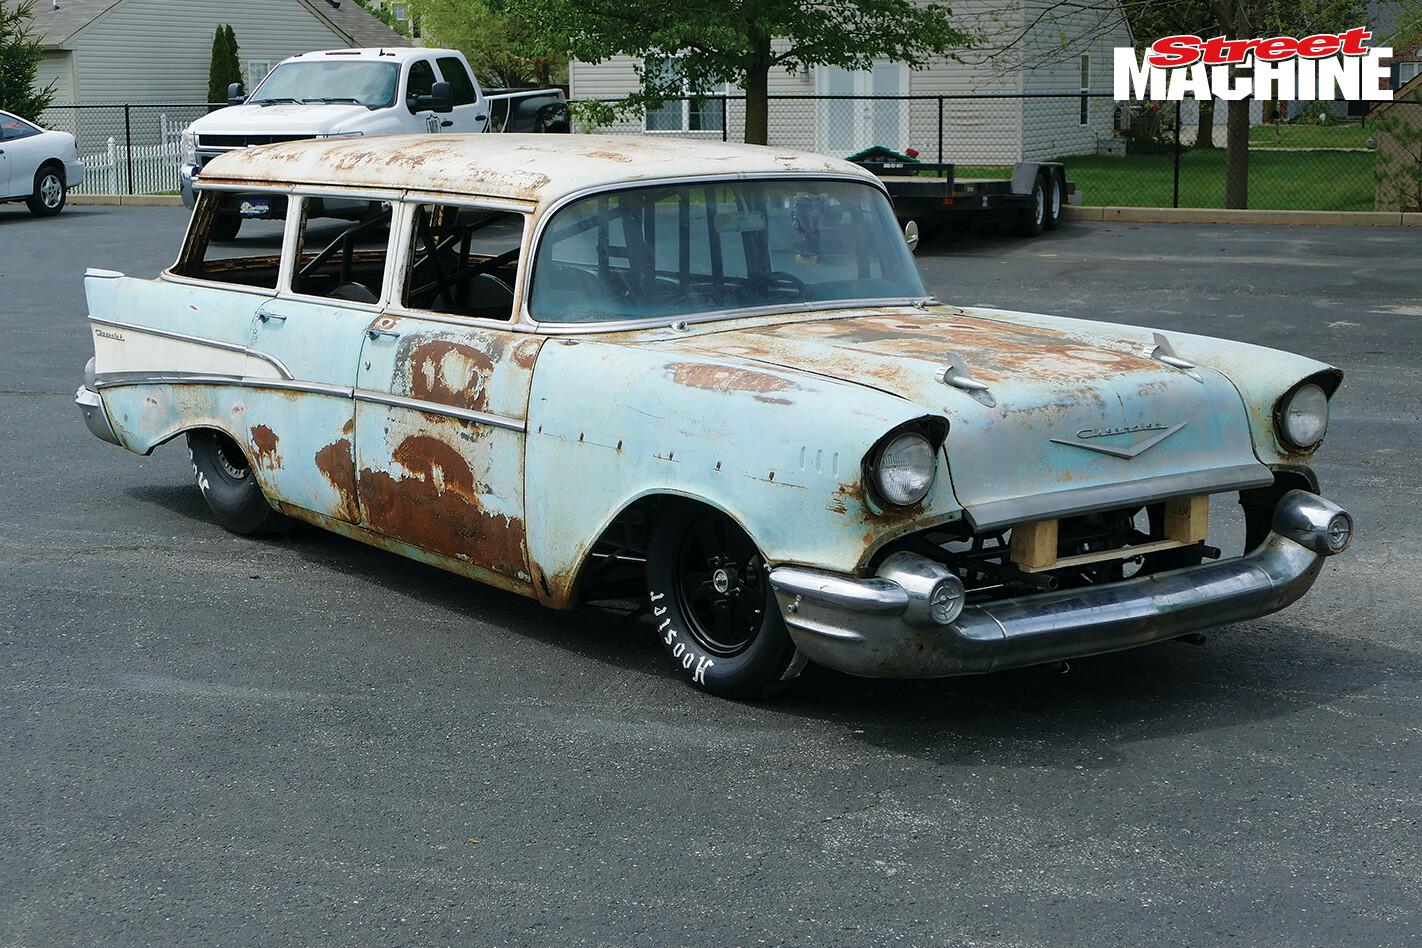 1957 Chev wagon